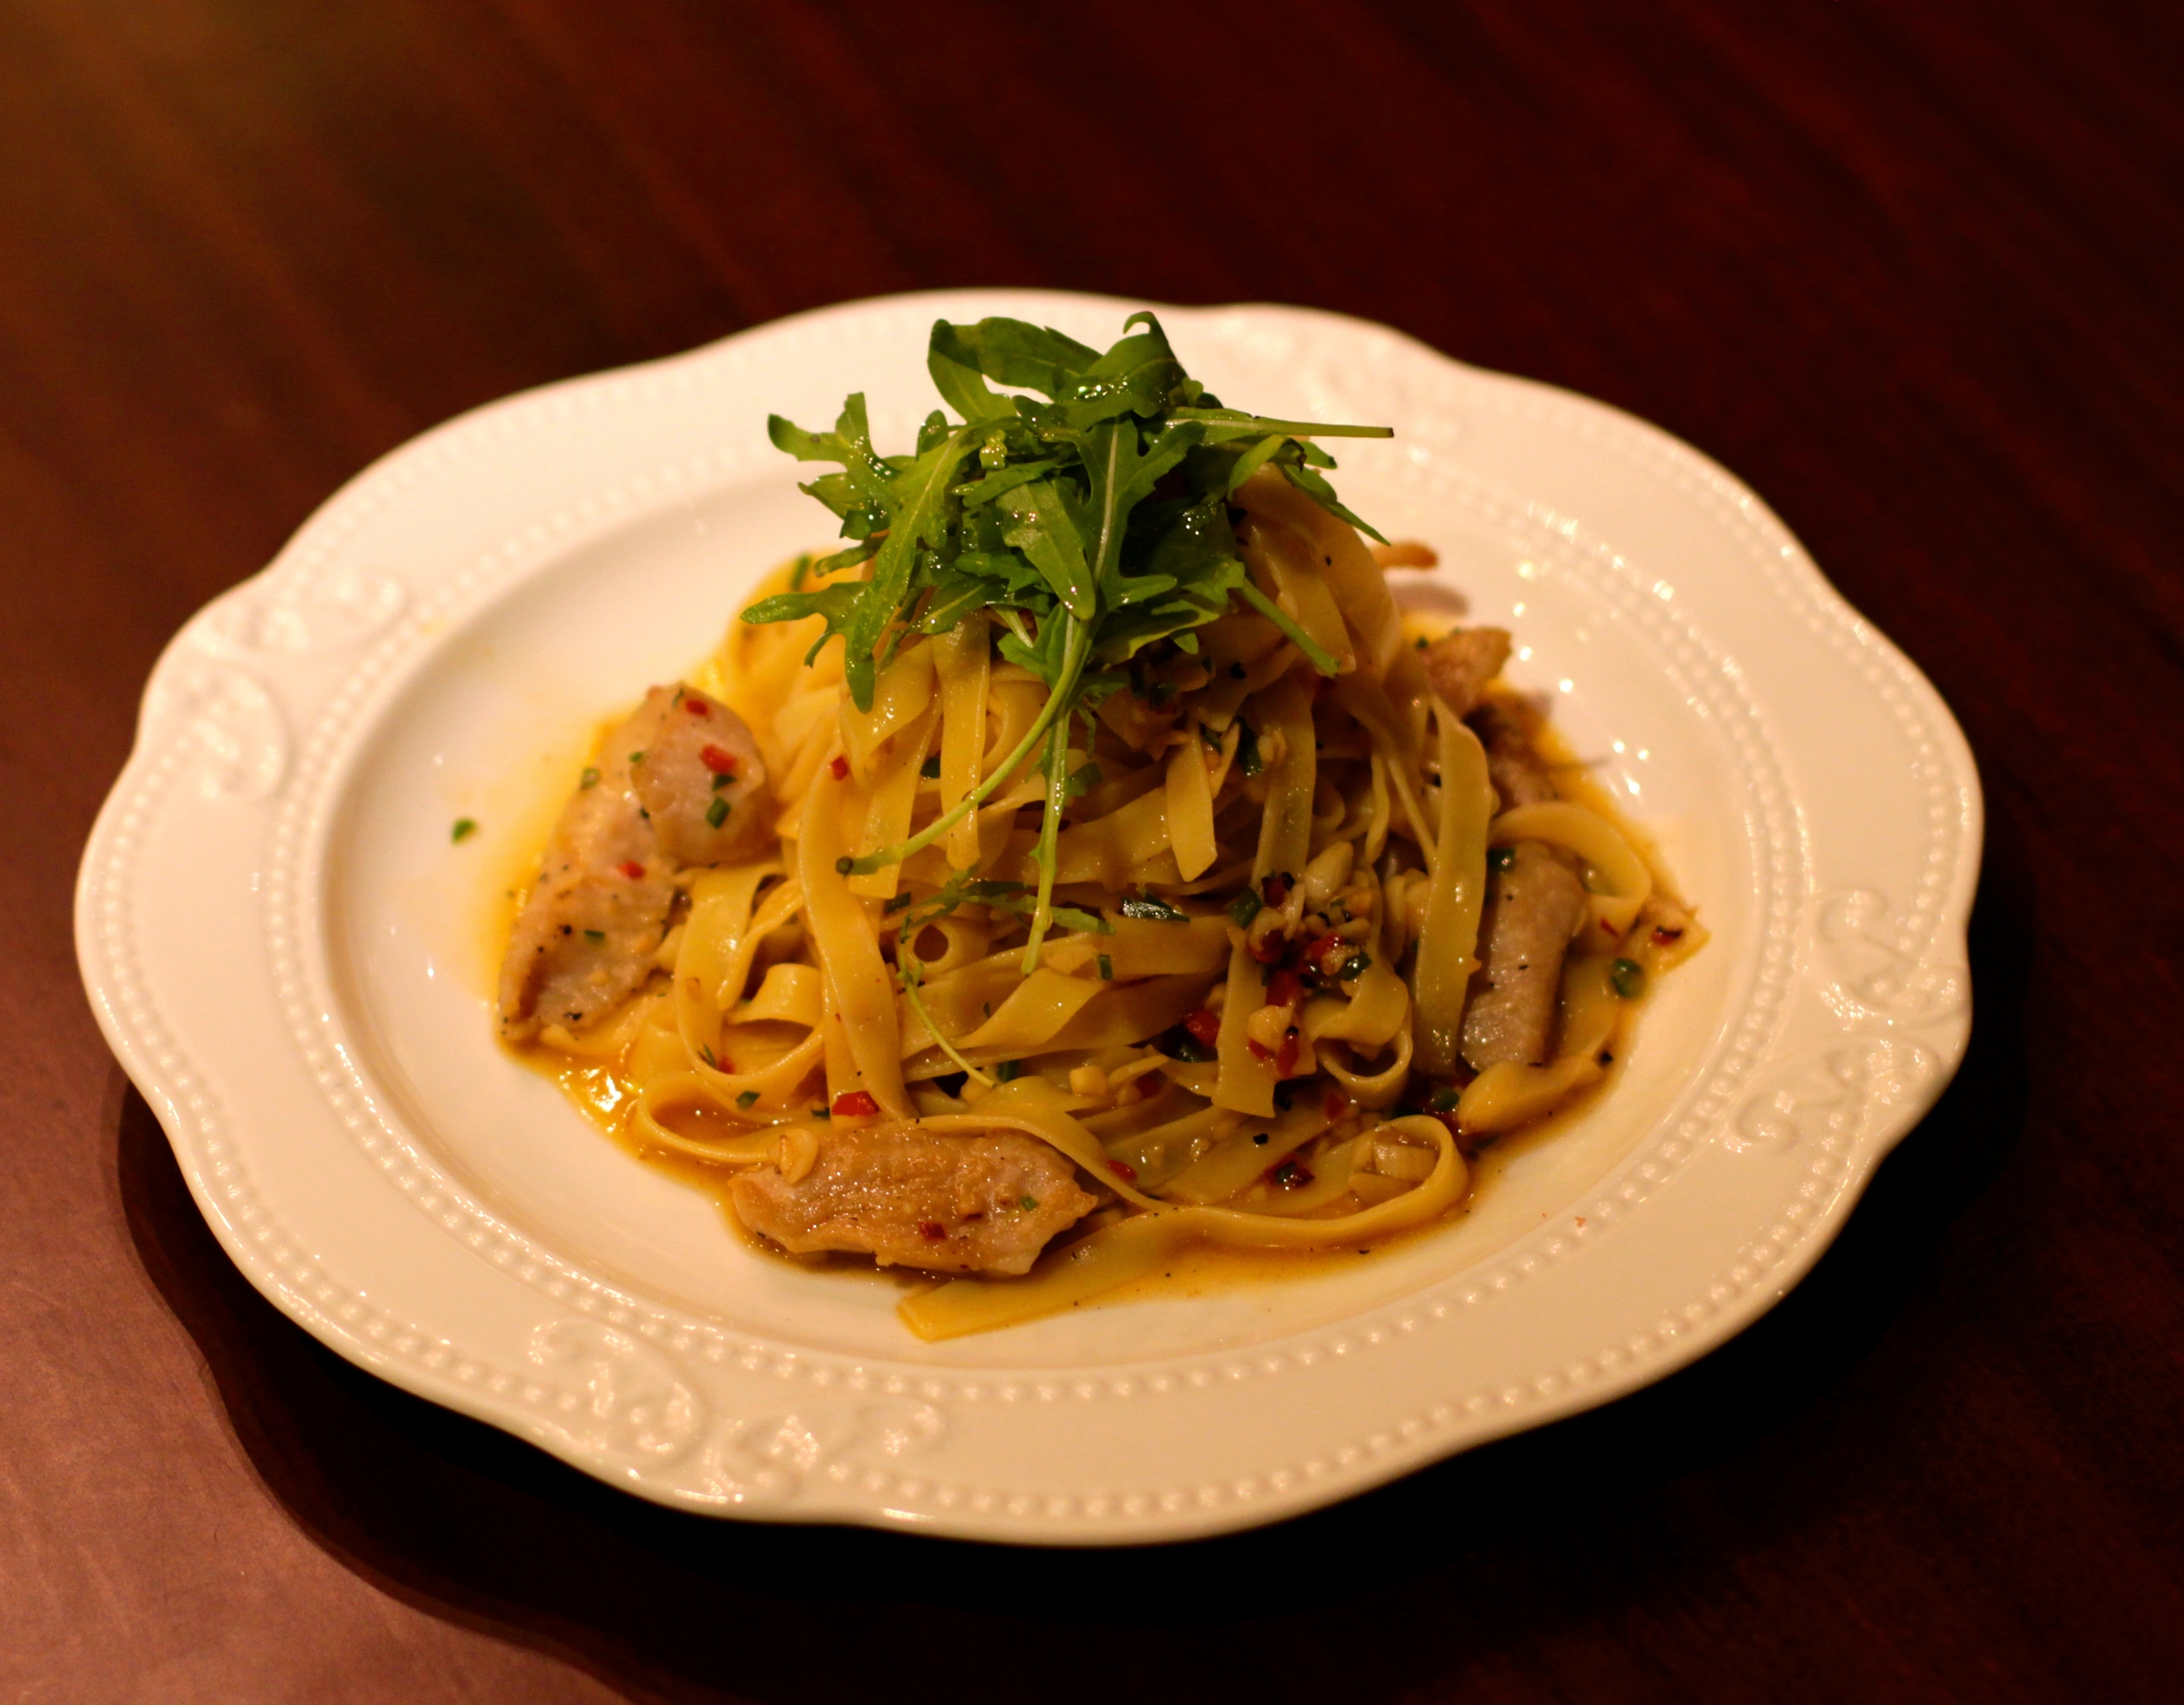 大蒜辣椒豬頸肉義大利麵 Chilli and Garlic Fettuccine with Matuskaka Pork